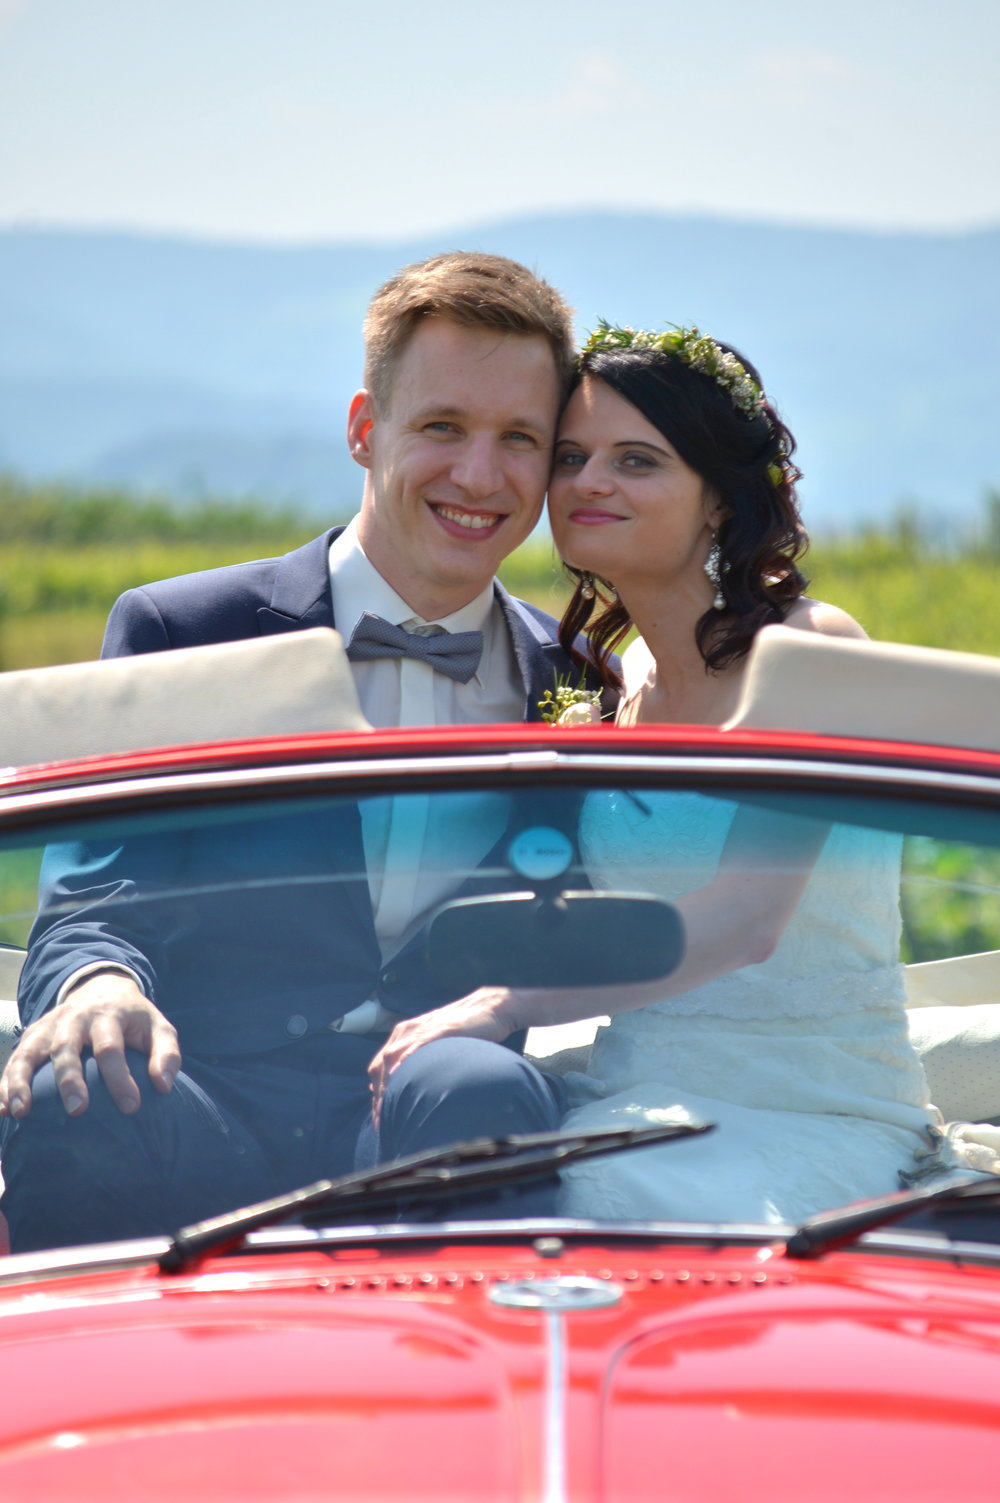 Hochzeitsfotografien, Ortenau, Fotografin, Paarshooting, Liebe.JPG